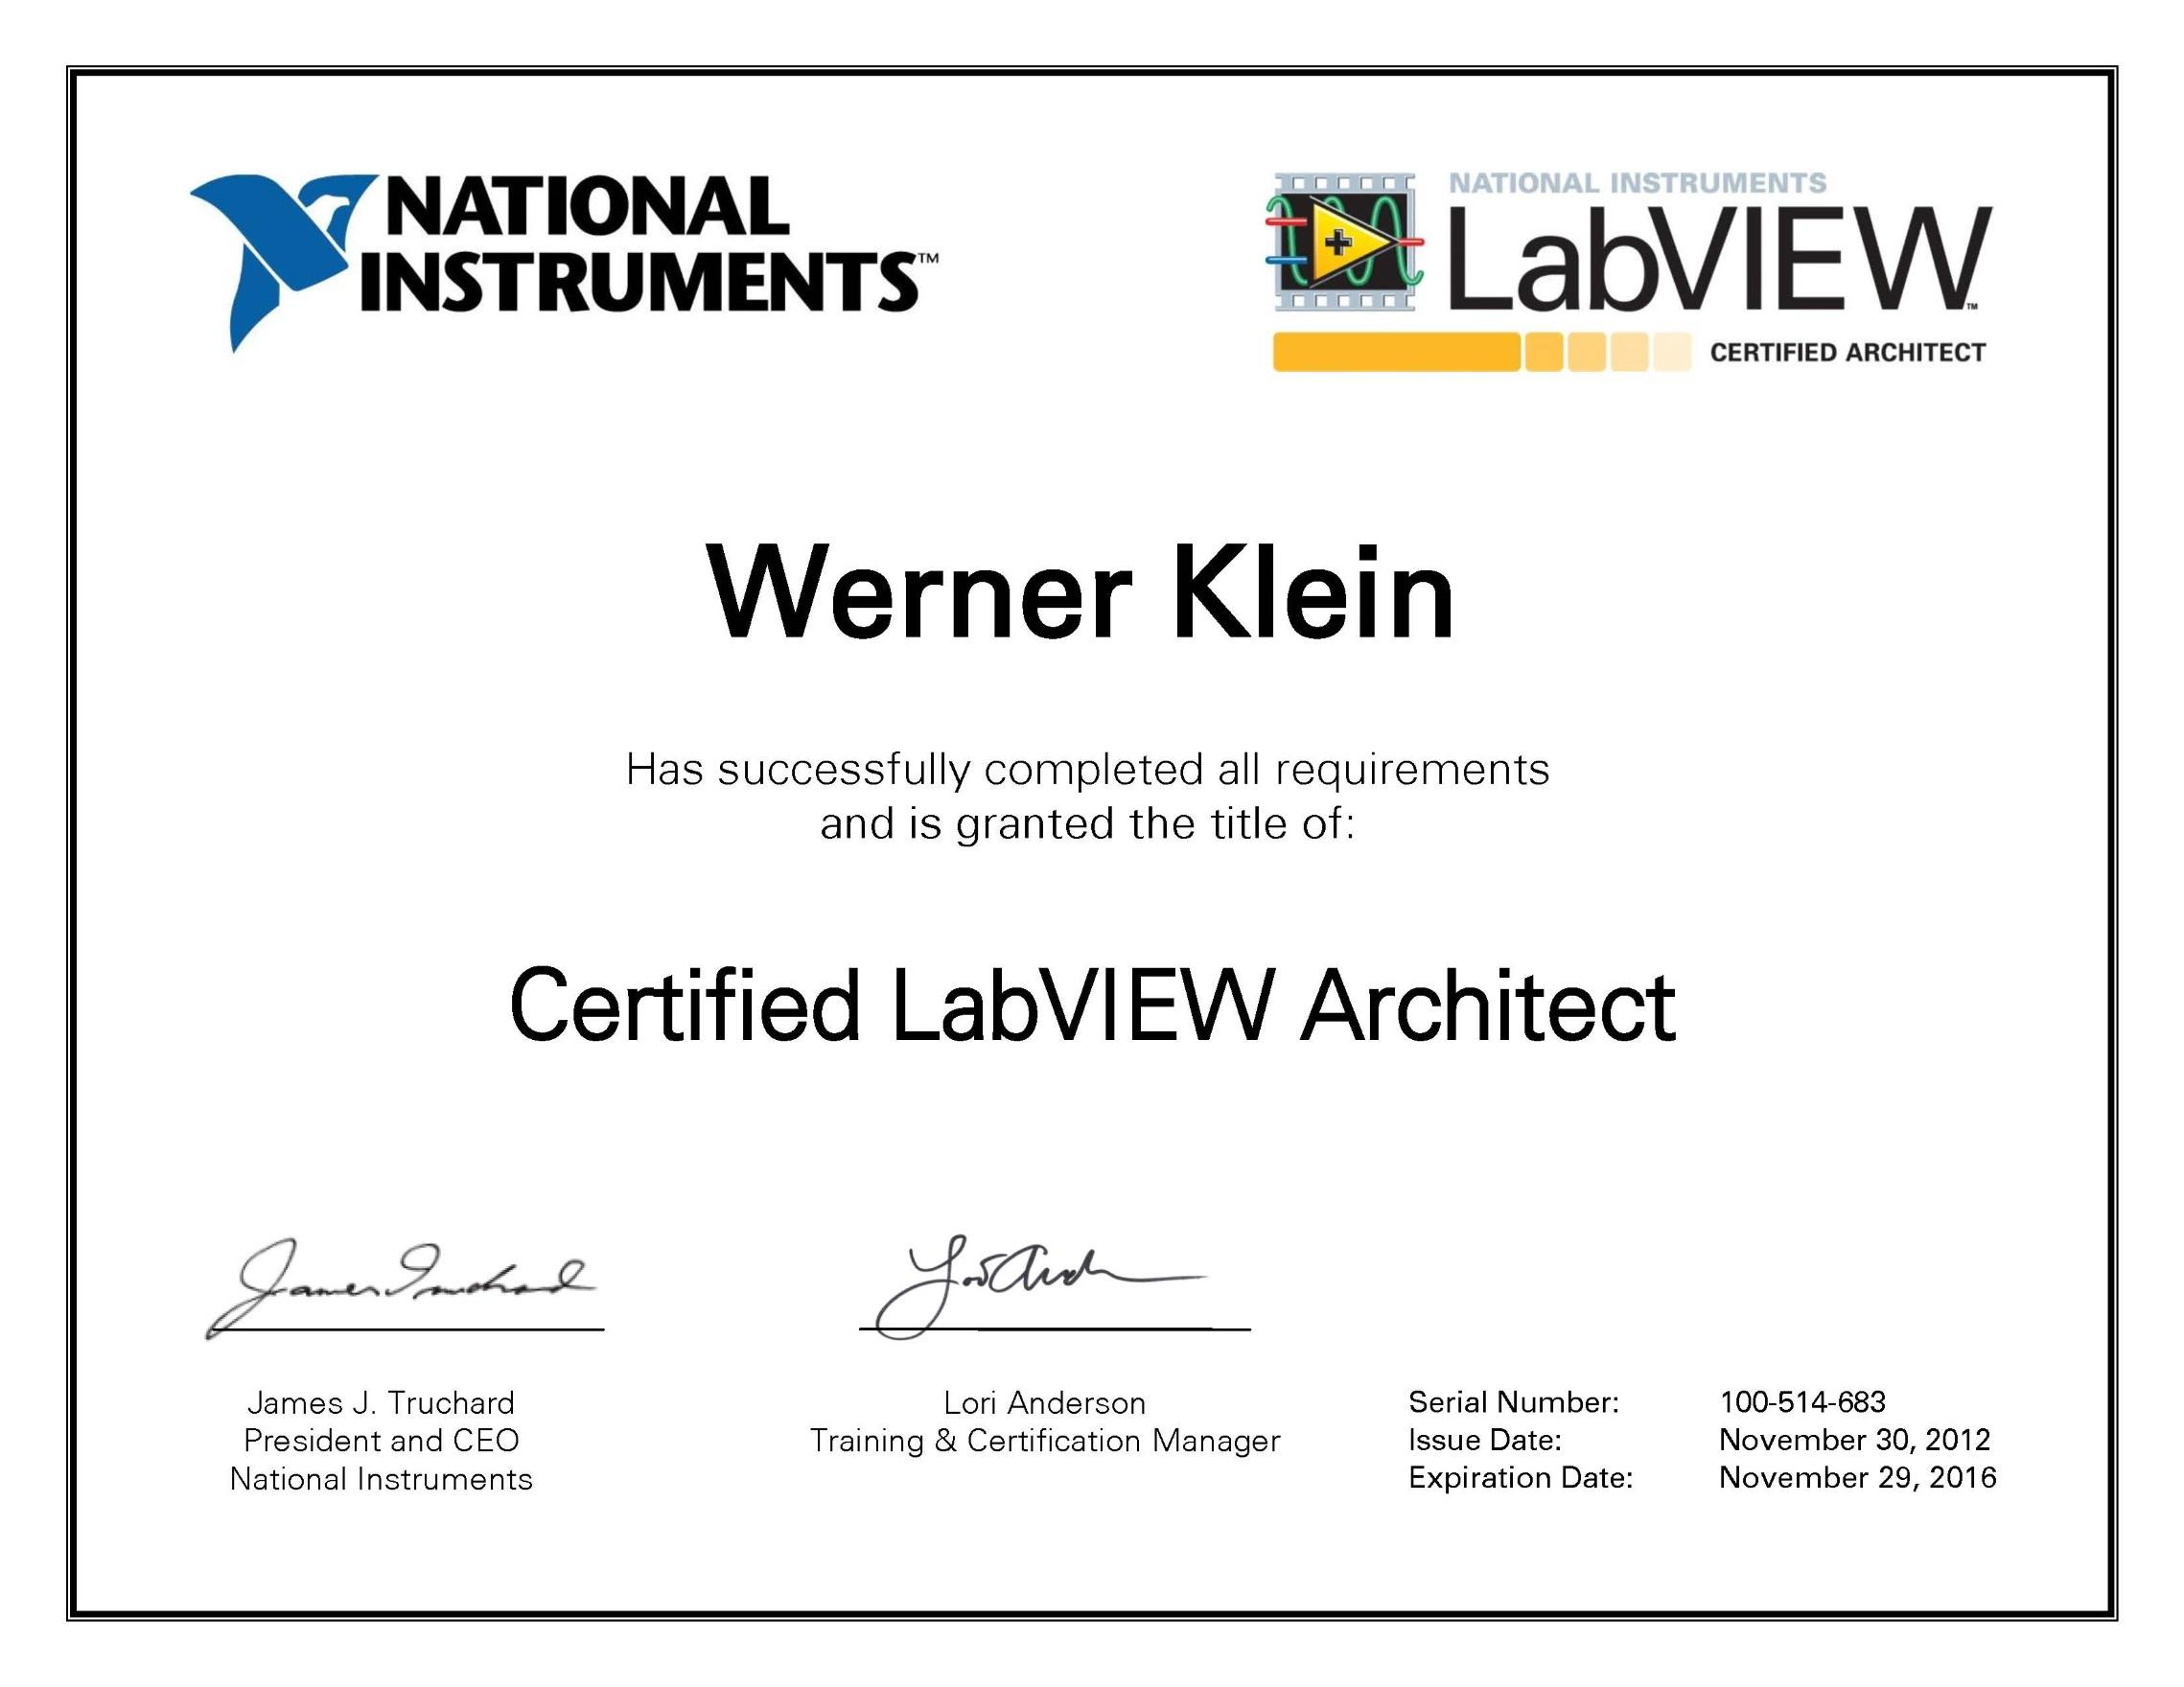 Labview softwareentwicklung beck messtechnik for Certified architect